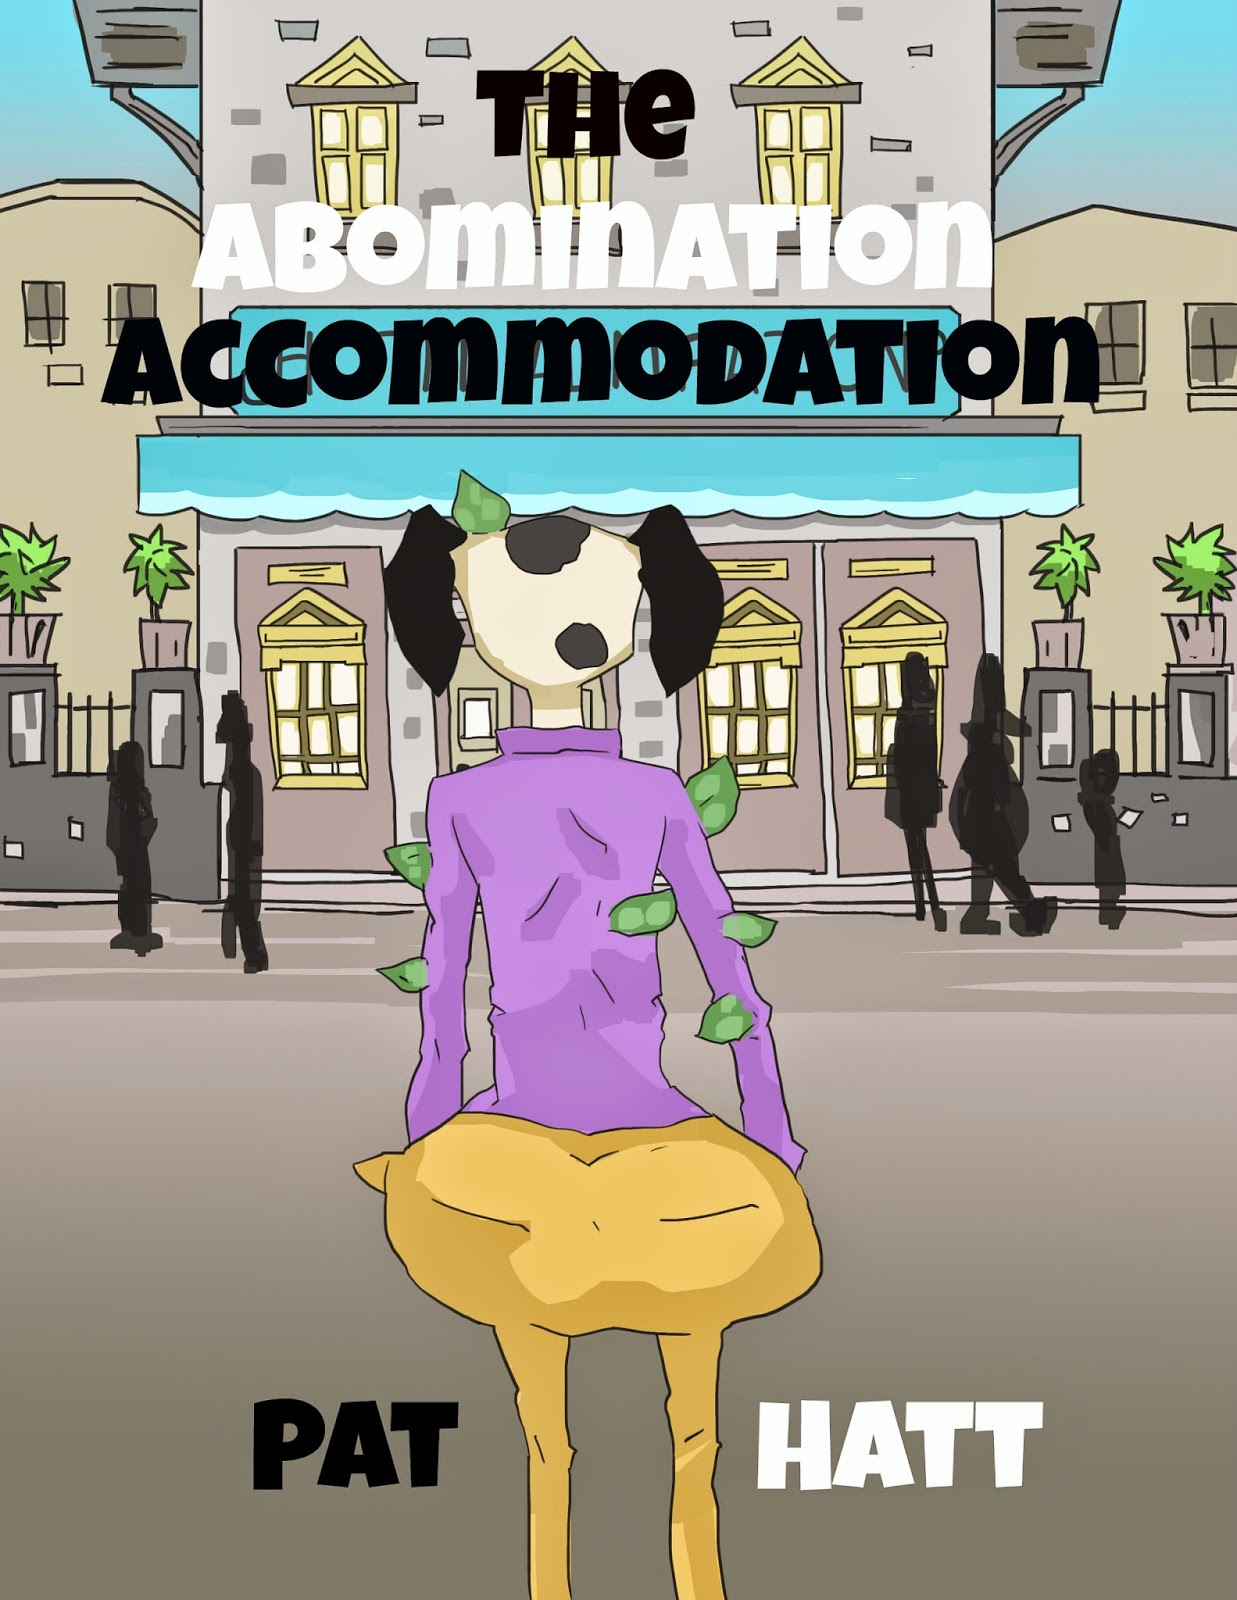 http://www.amazon.com/Abomination-Accommodation-Pat-Hatt-ebook/dp/B00VEJA7SQ